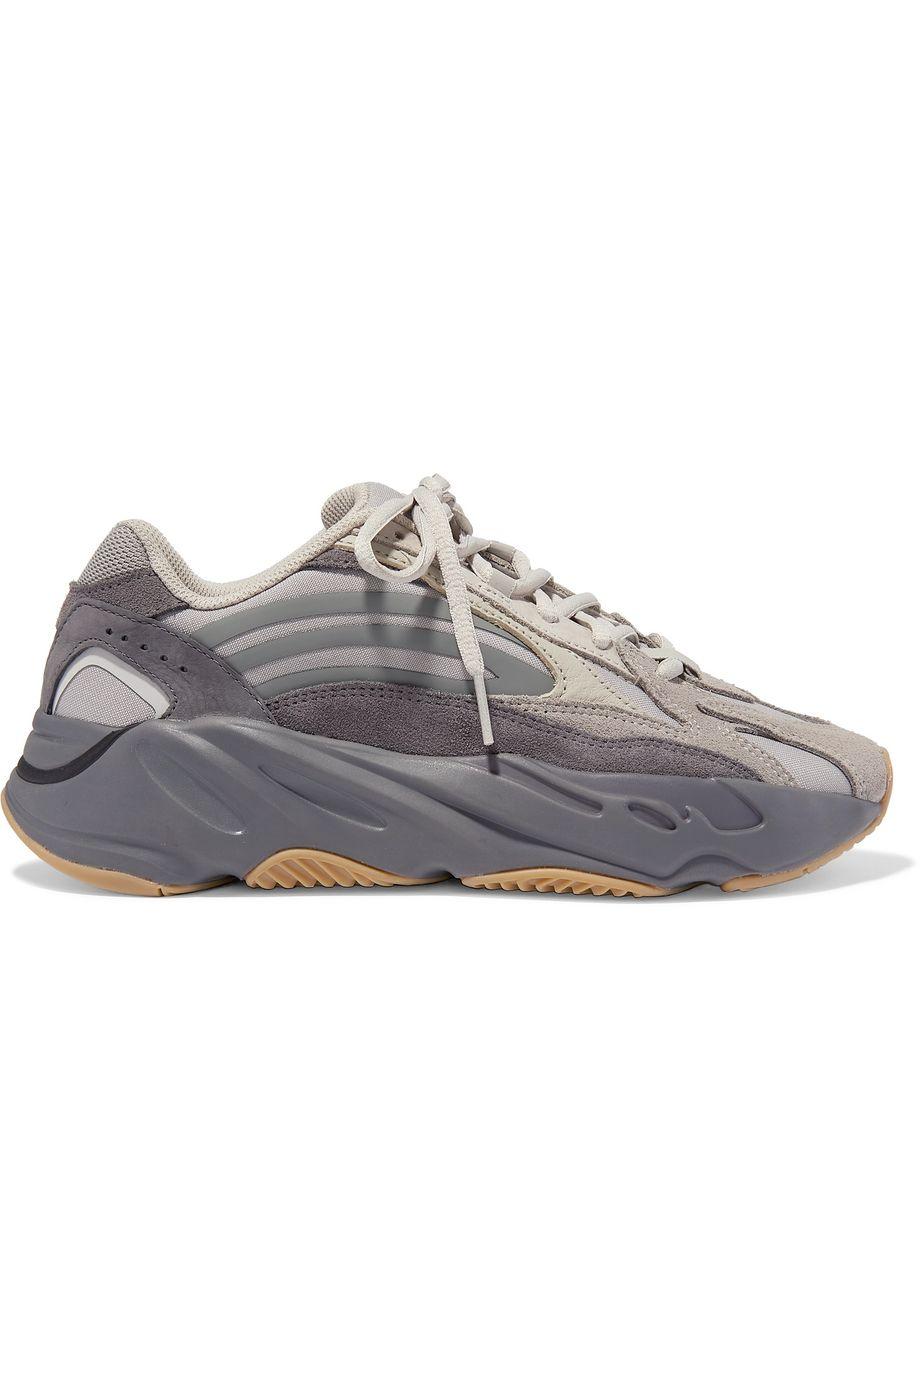 adidas Originals Baskets en daim, résille et cuir Yeezy Boost 700 V2